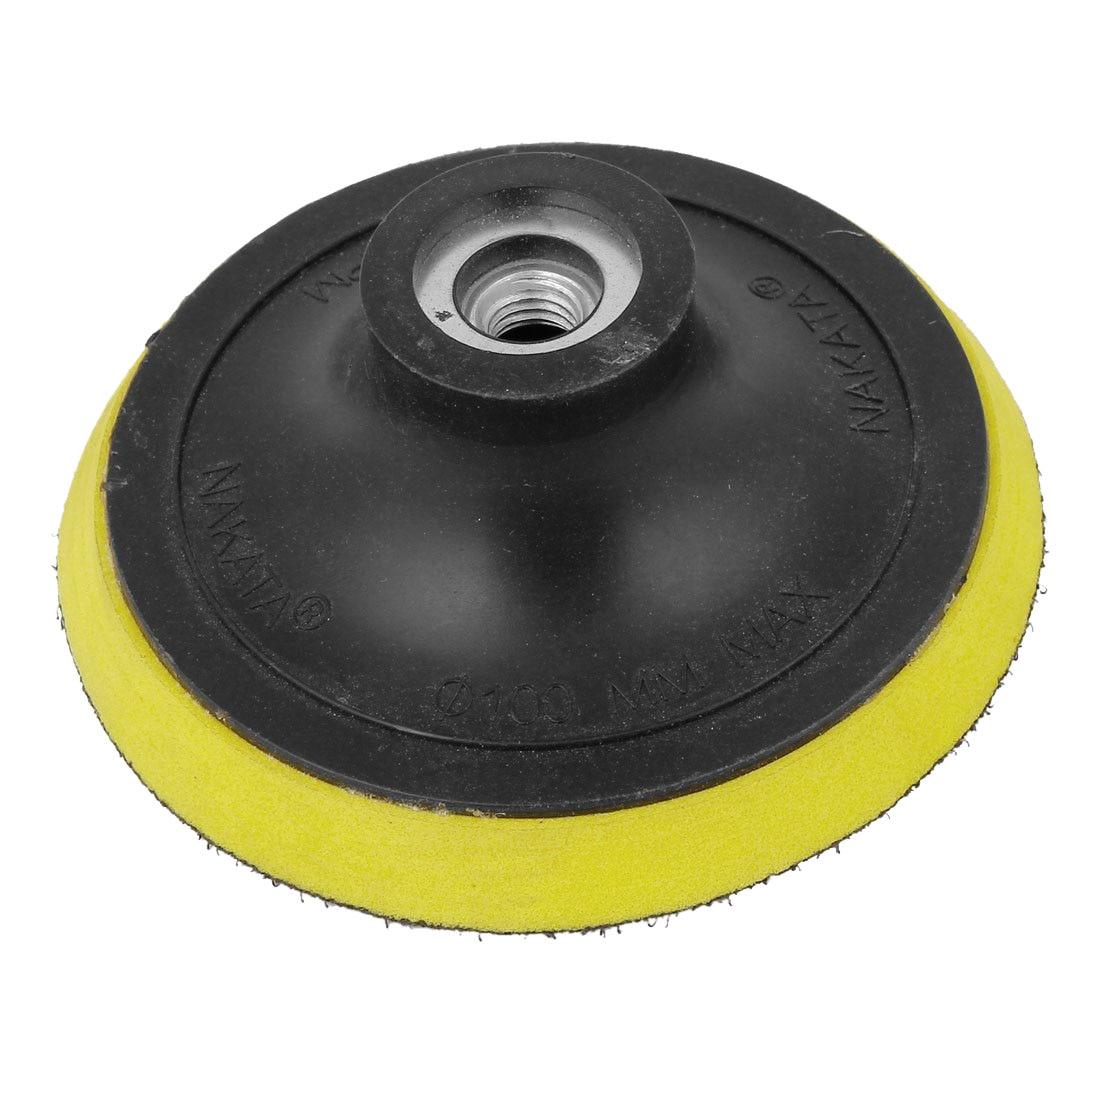 CNIM Hot Angle Grinder Sanding Polishing Hook and Loop Backing Pad 4 Dia